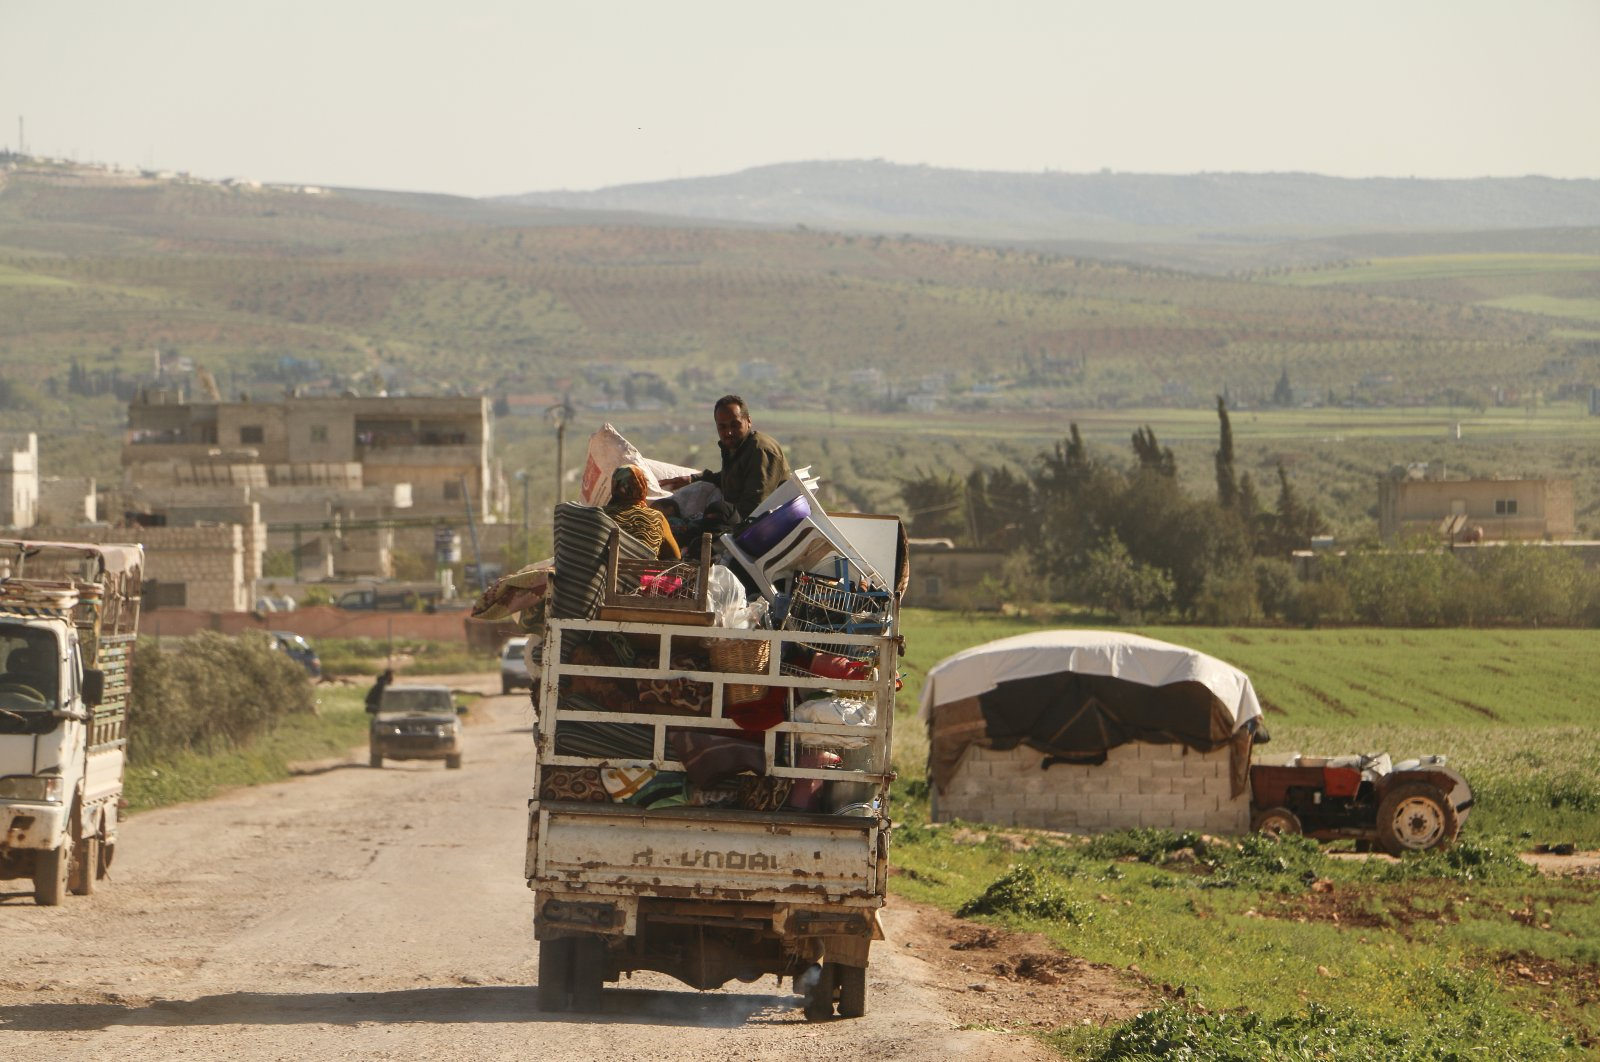 Syrian civilians return to the northwestern province of Idlib, as the coronavirus pandemic threatens the vulnerable region, northern Syria, April 13, 2020. (AA Photo)